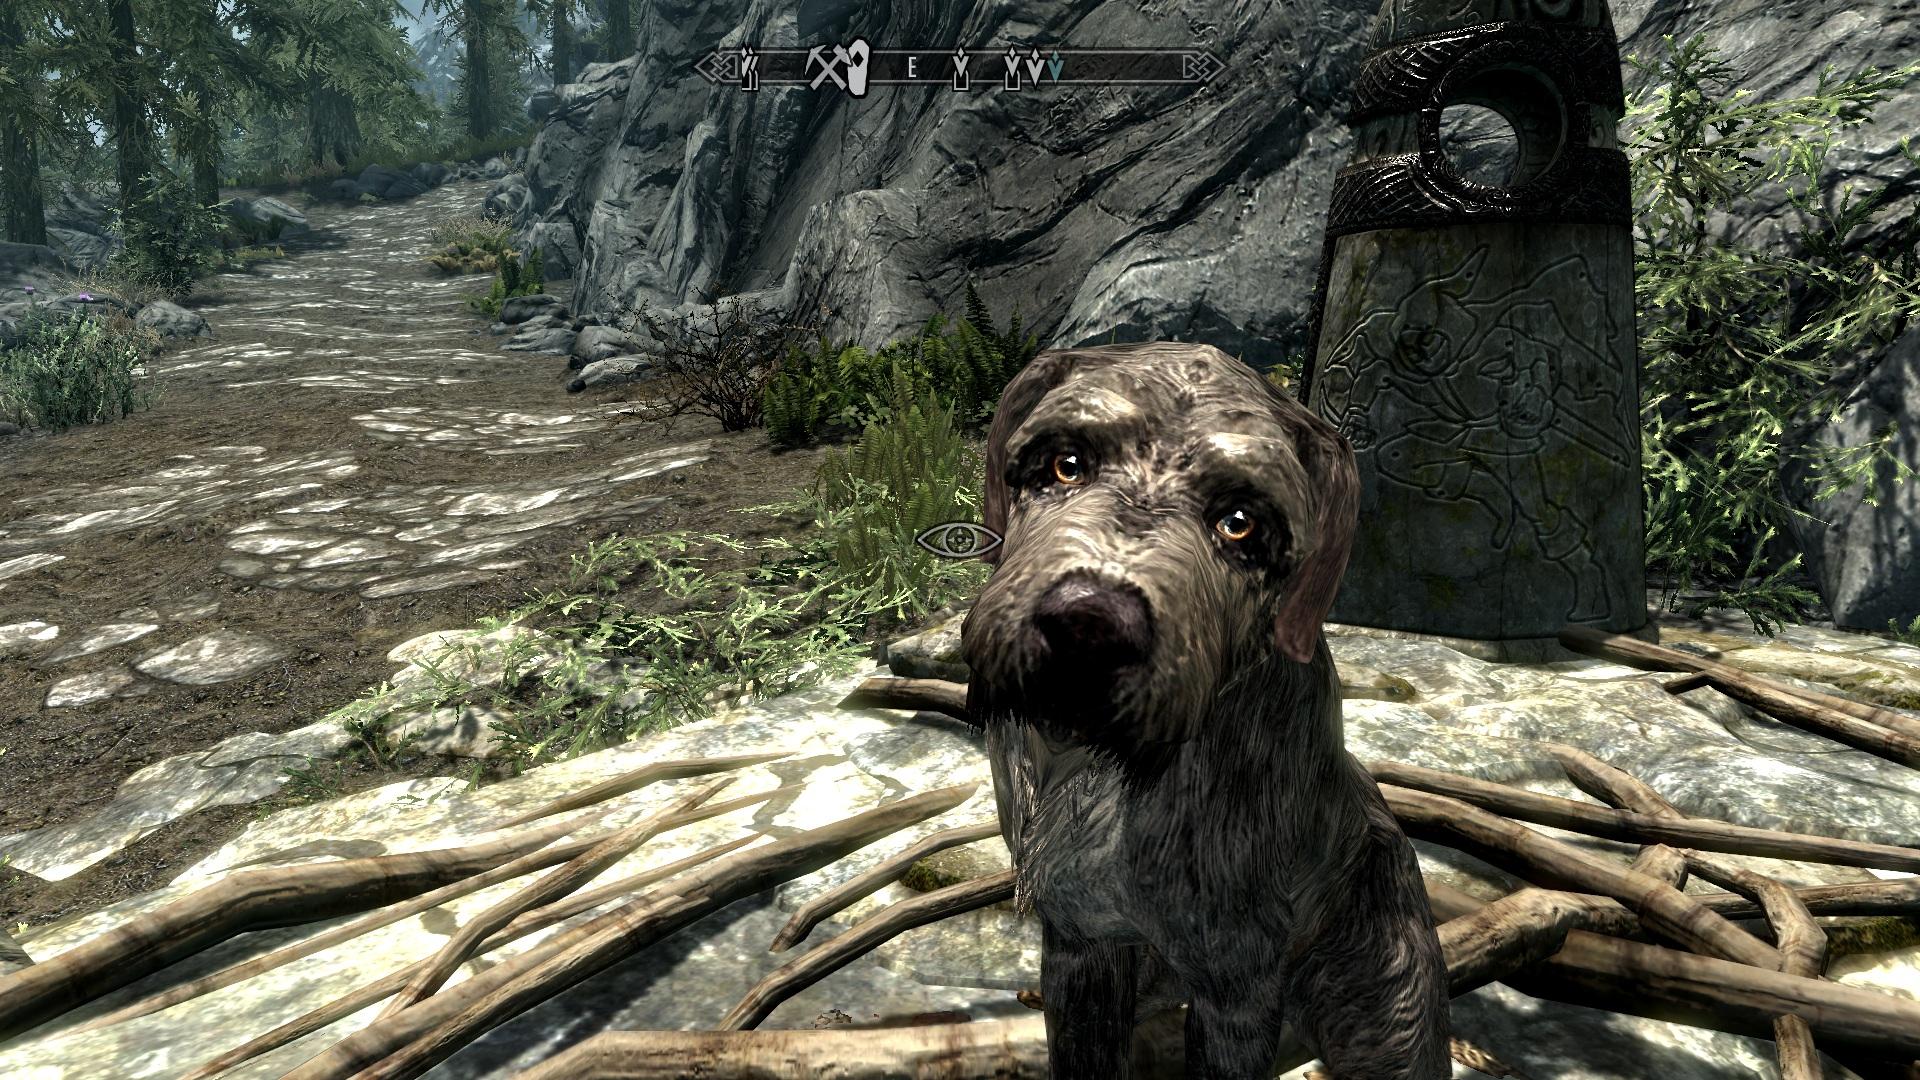 Собака друг человека - Elder Scrolls 5: Skyrim, the Барбас, собака